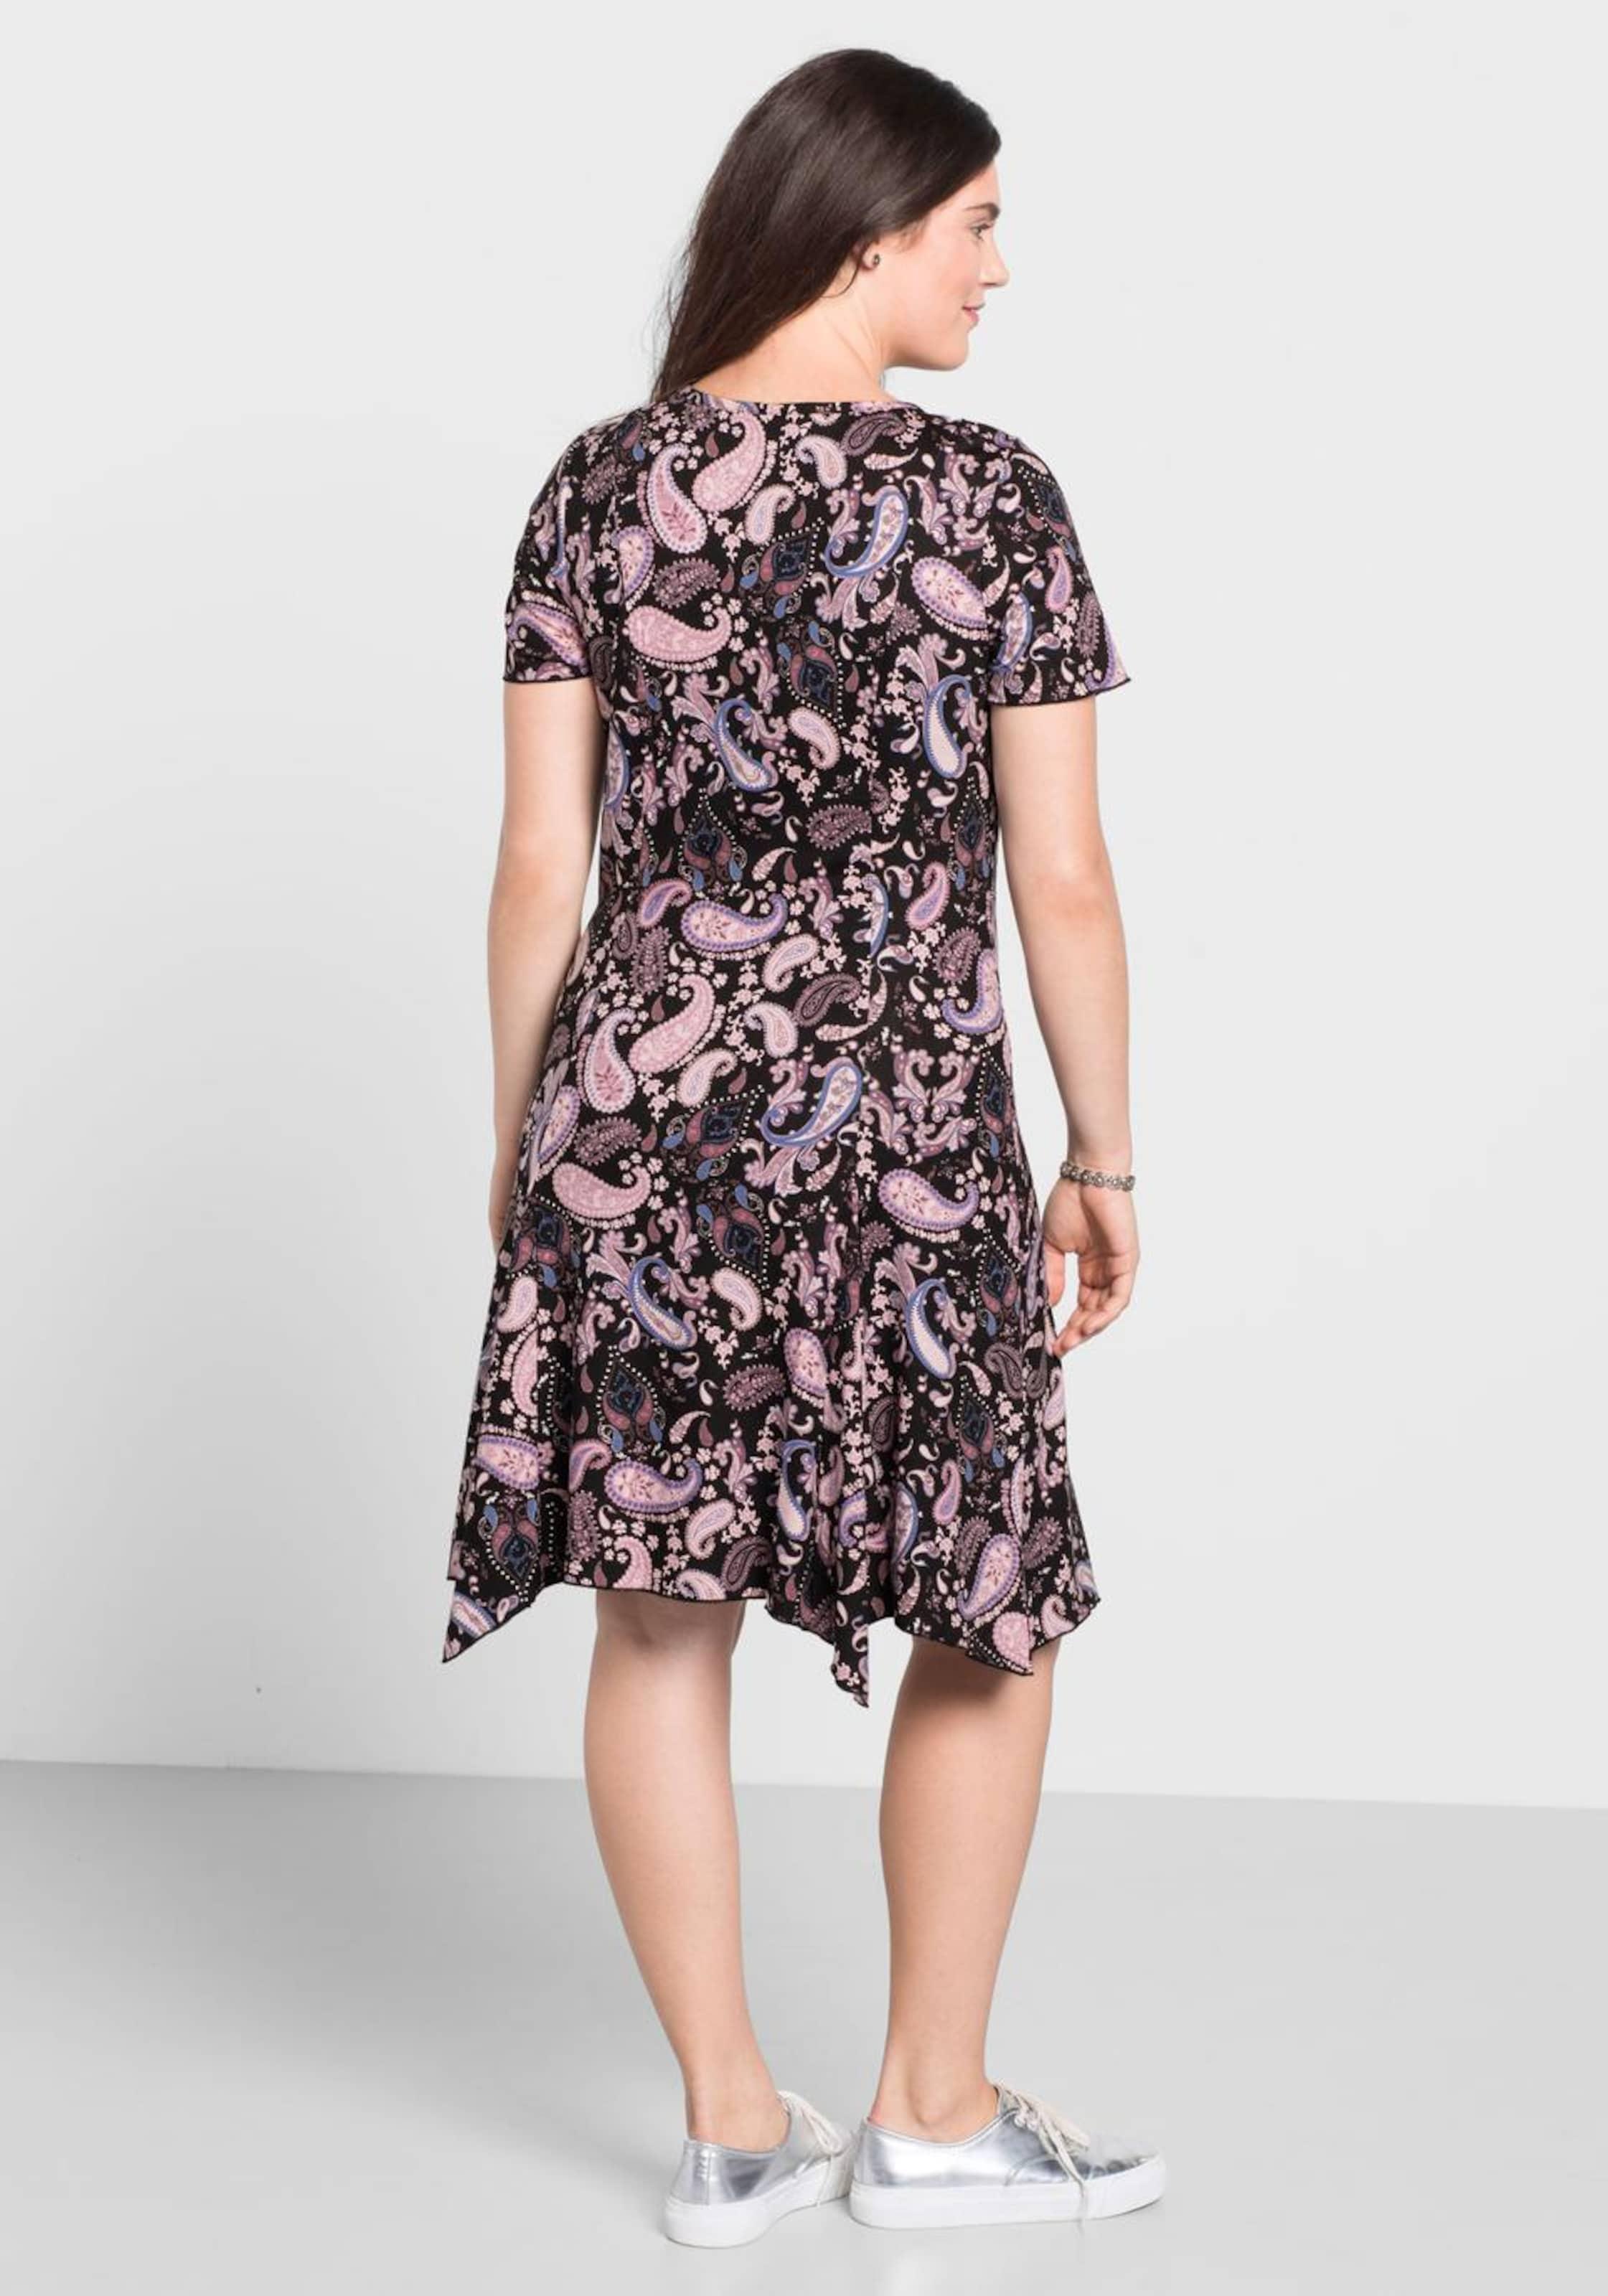 sheego casual Kleid mit Paisley-Muster Zum Verkauf Rabatt Verkauf 6SBIu7Bdgs